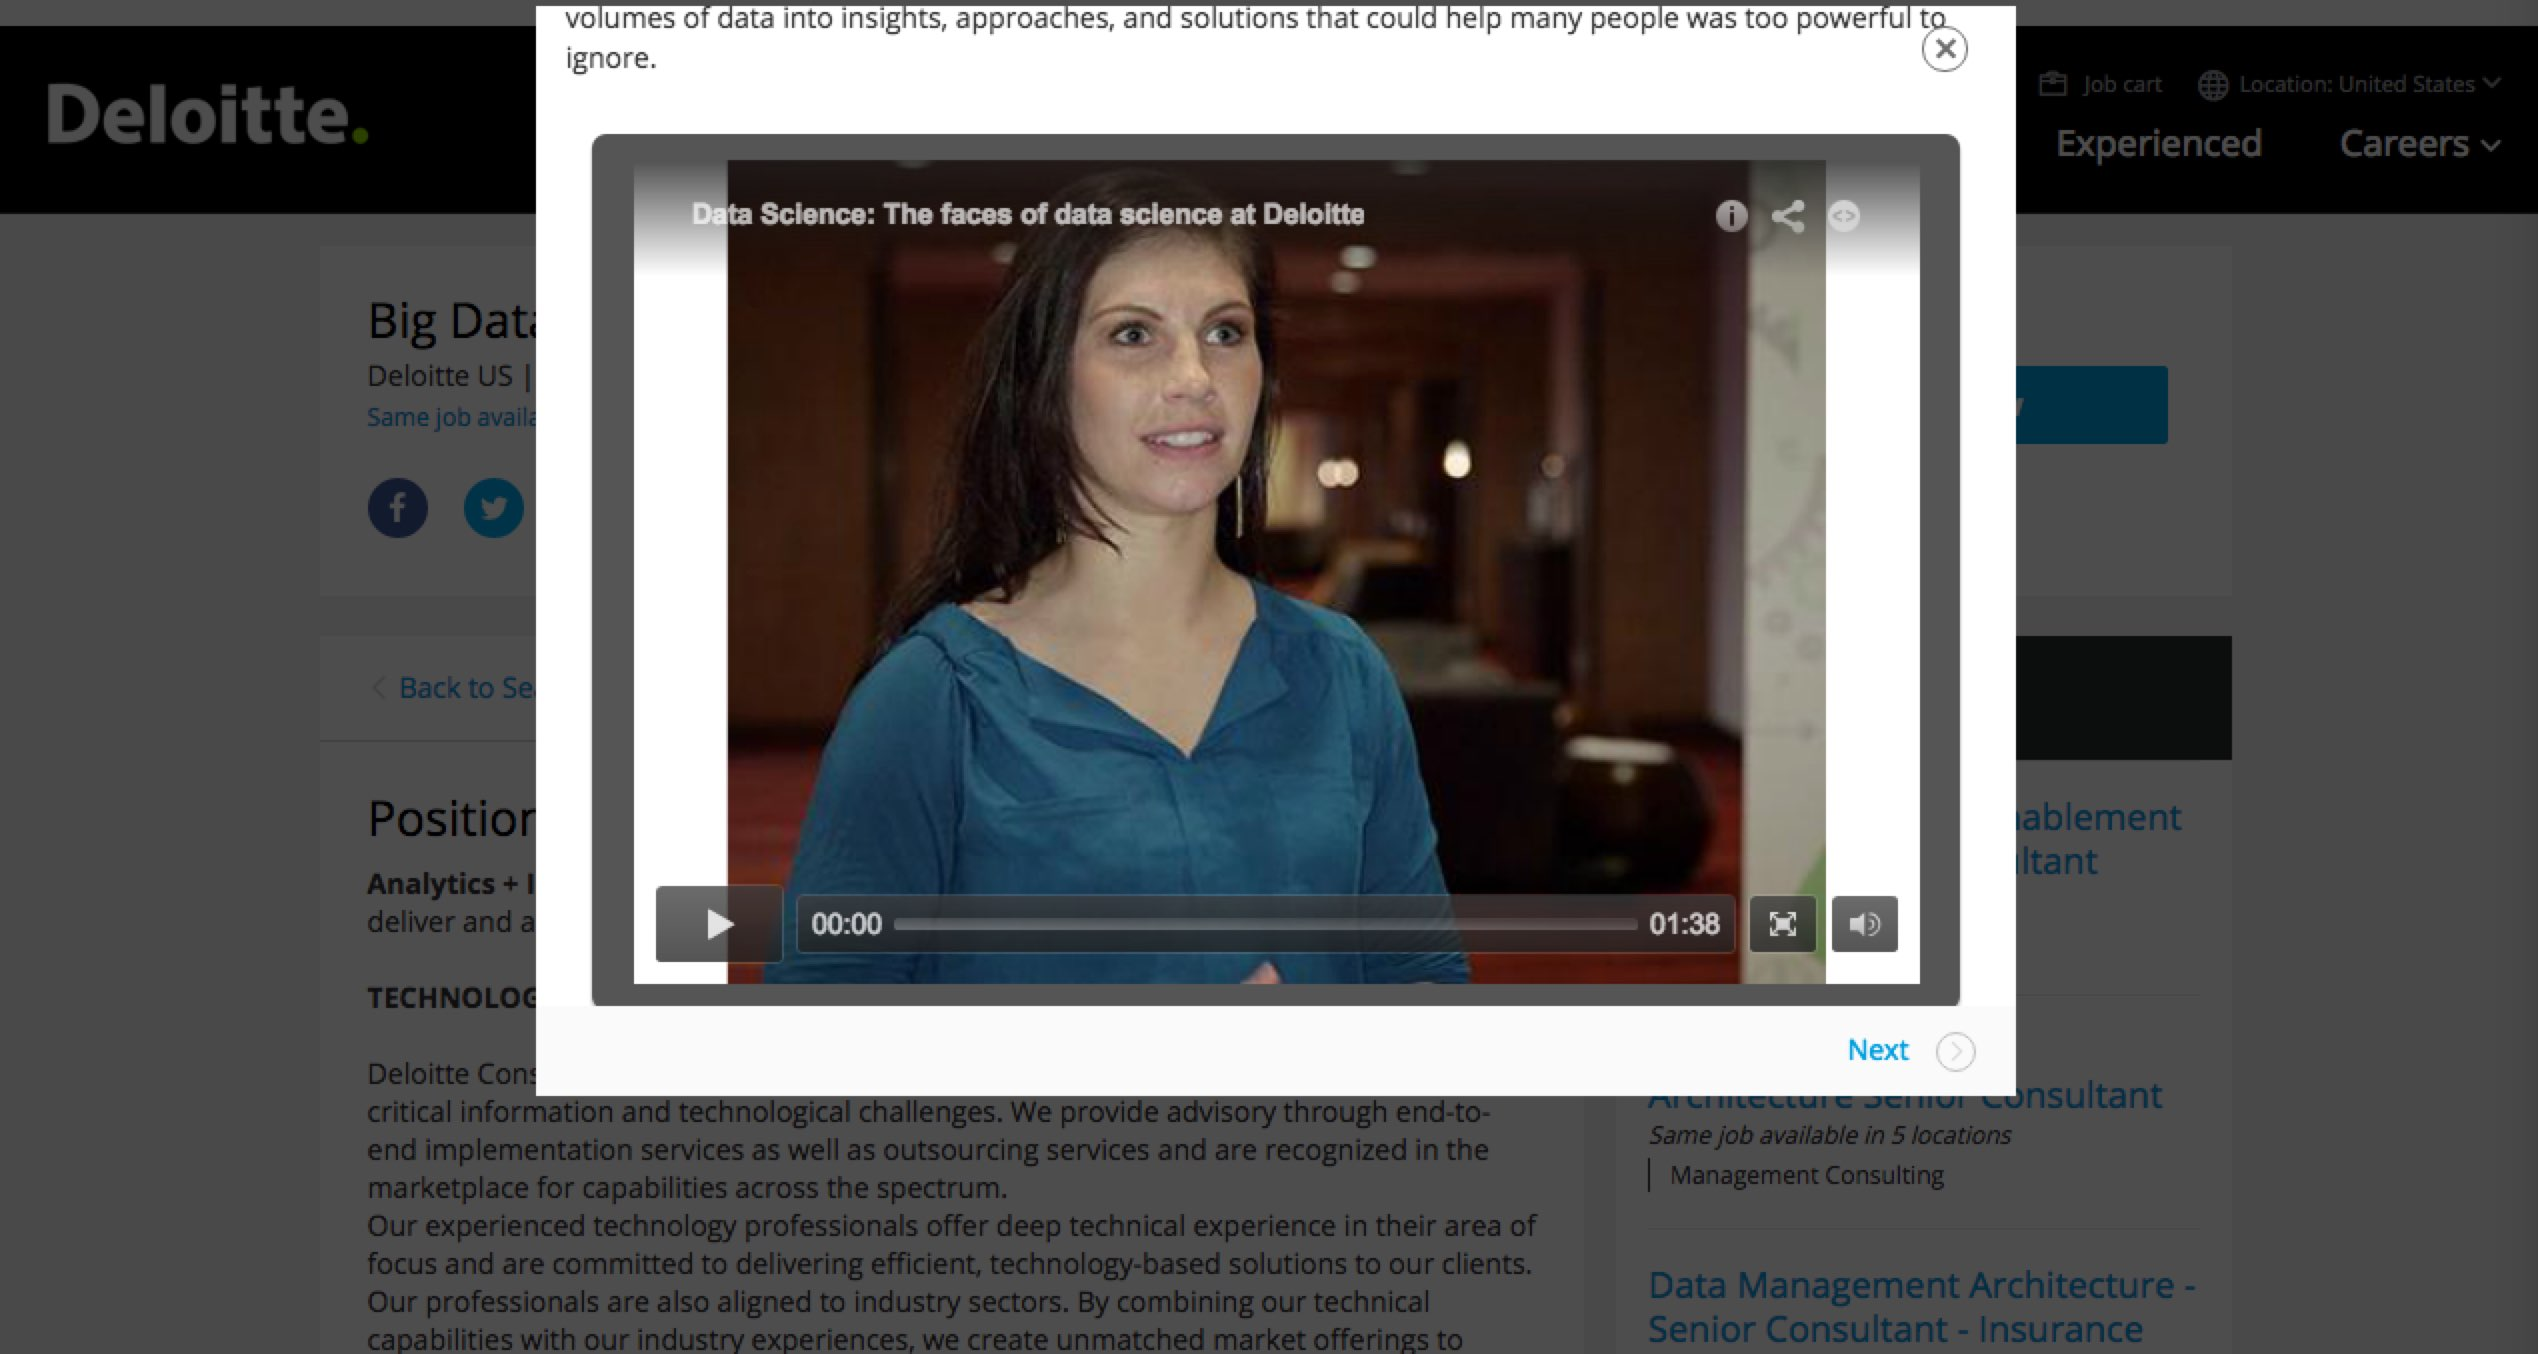 Video Job Description Deloitte Sample | Ongig